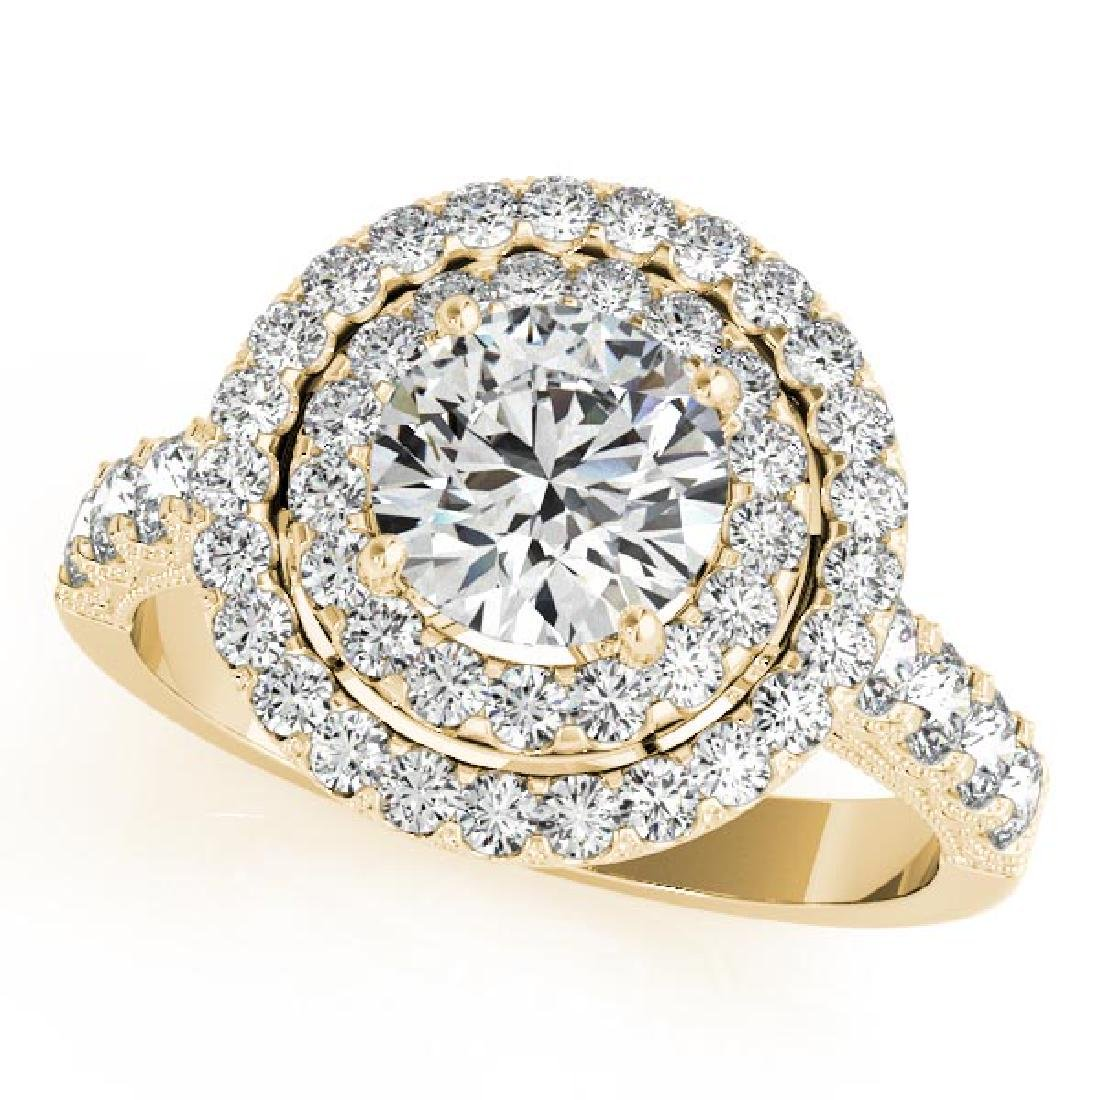 CERTIFIED 18K YELLOW GOLD 2.32 CT G-H/VS-SI1 DIAMOND HA